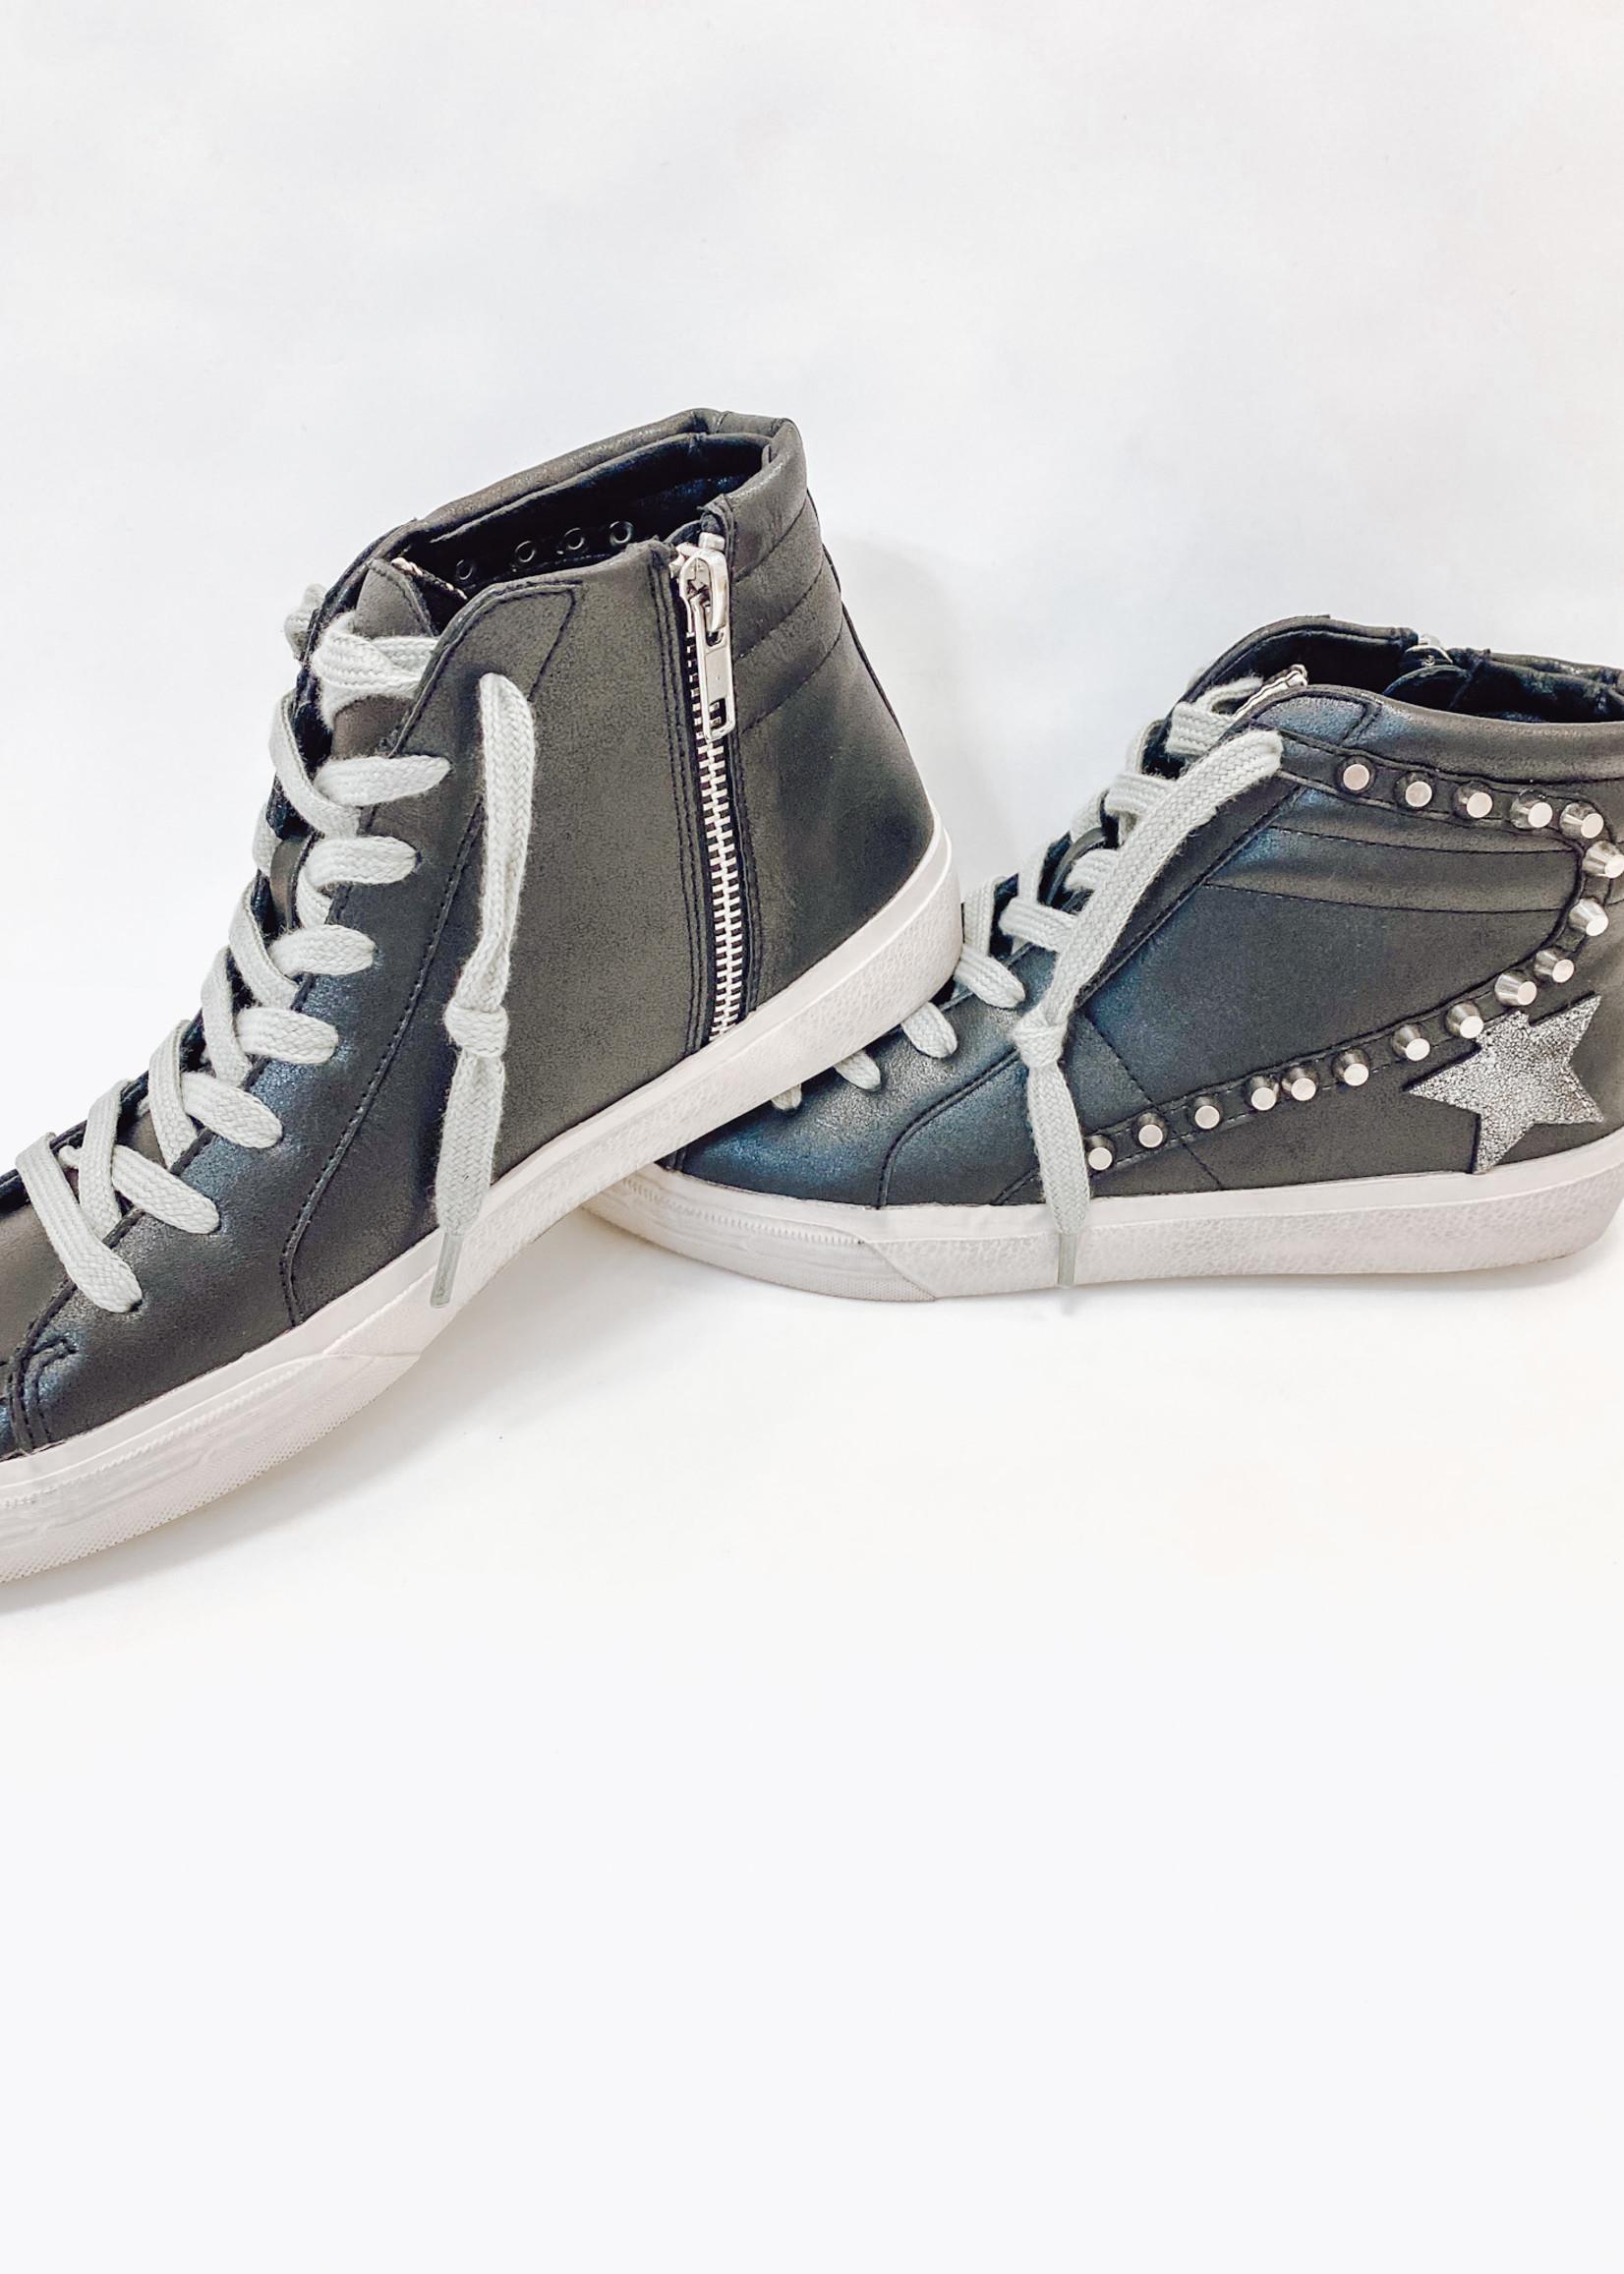 The Riri Sneaker